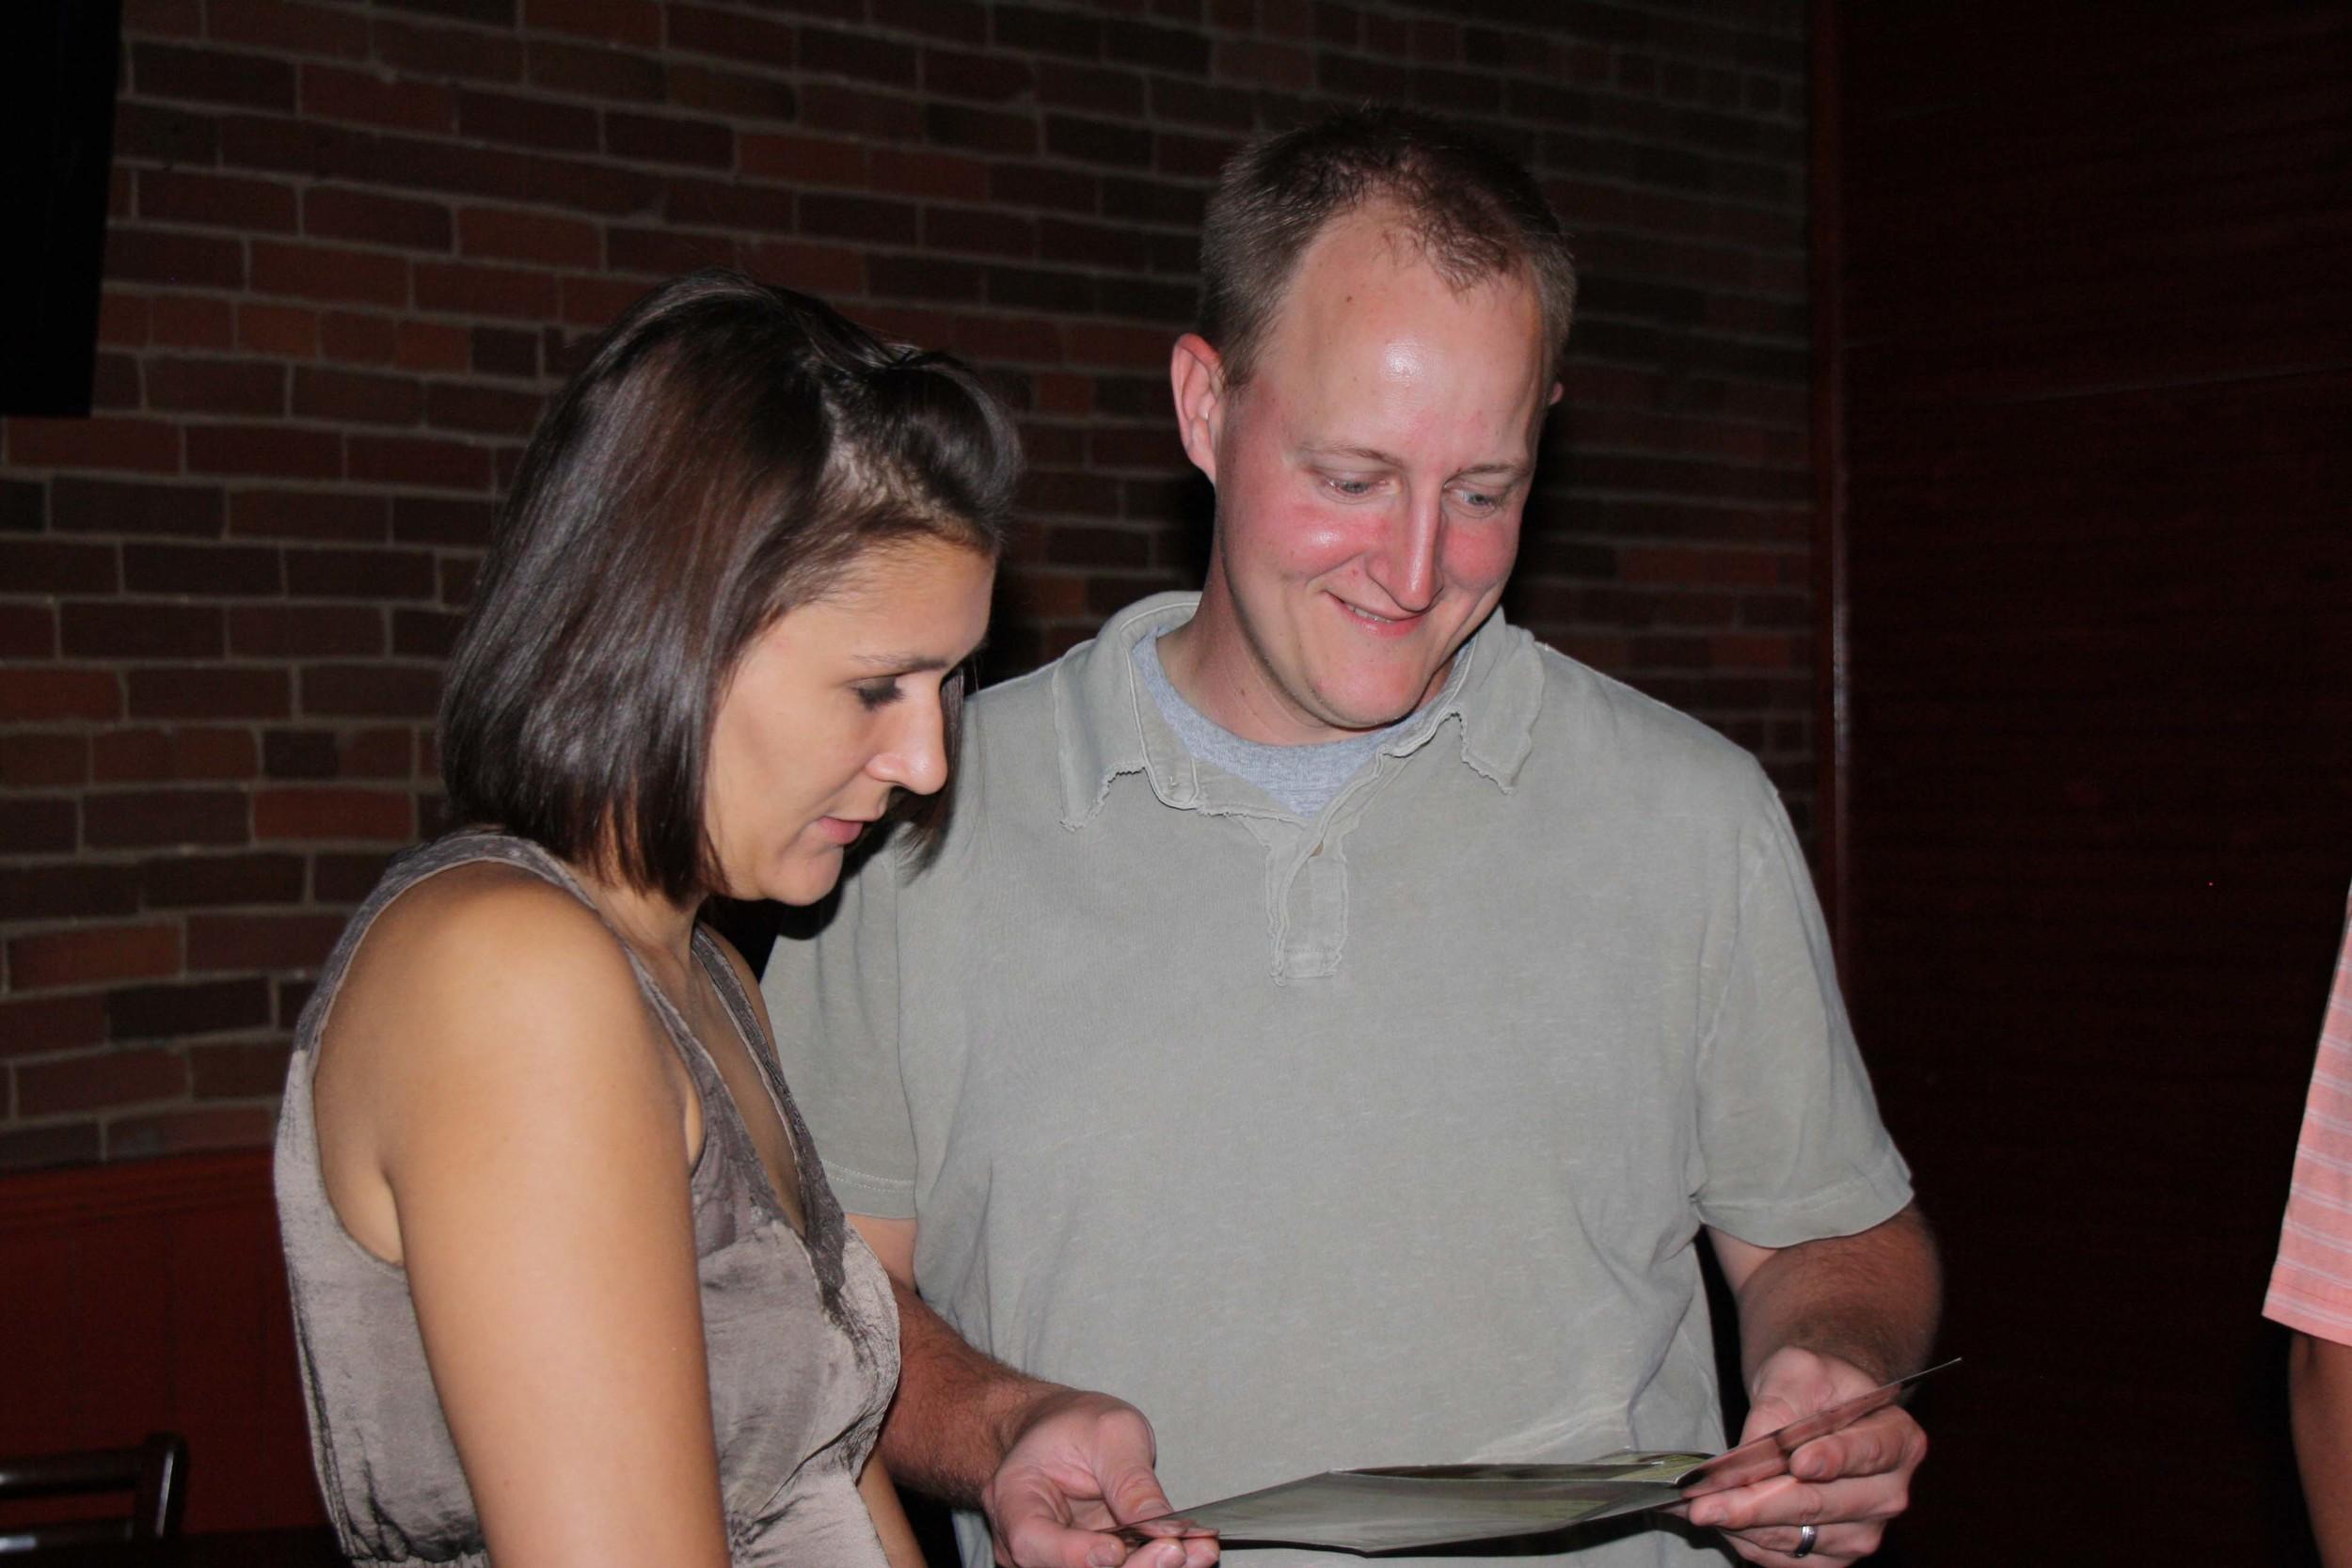 Second Annual FIJI Gathering - August 13, 2011 (Image 335).jpg